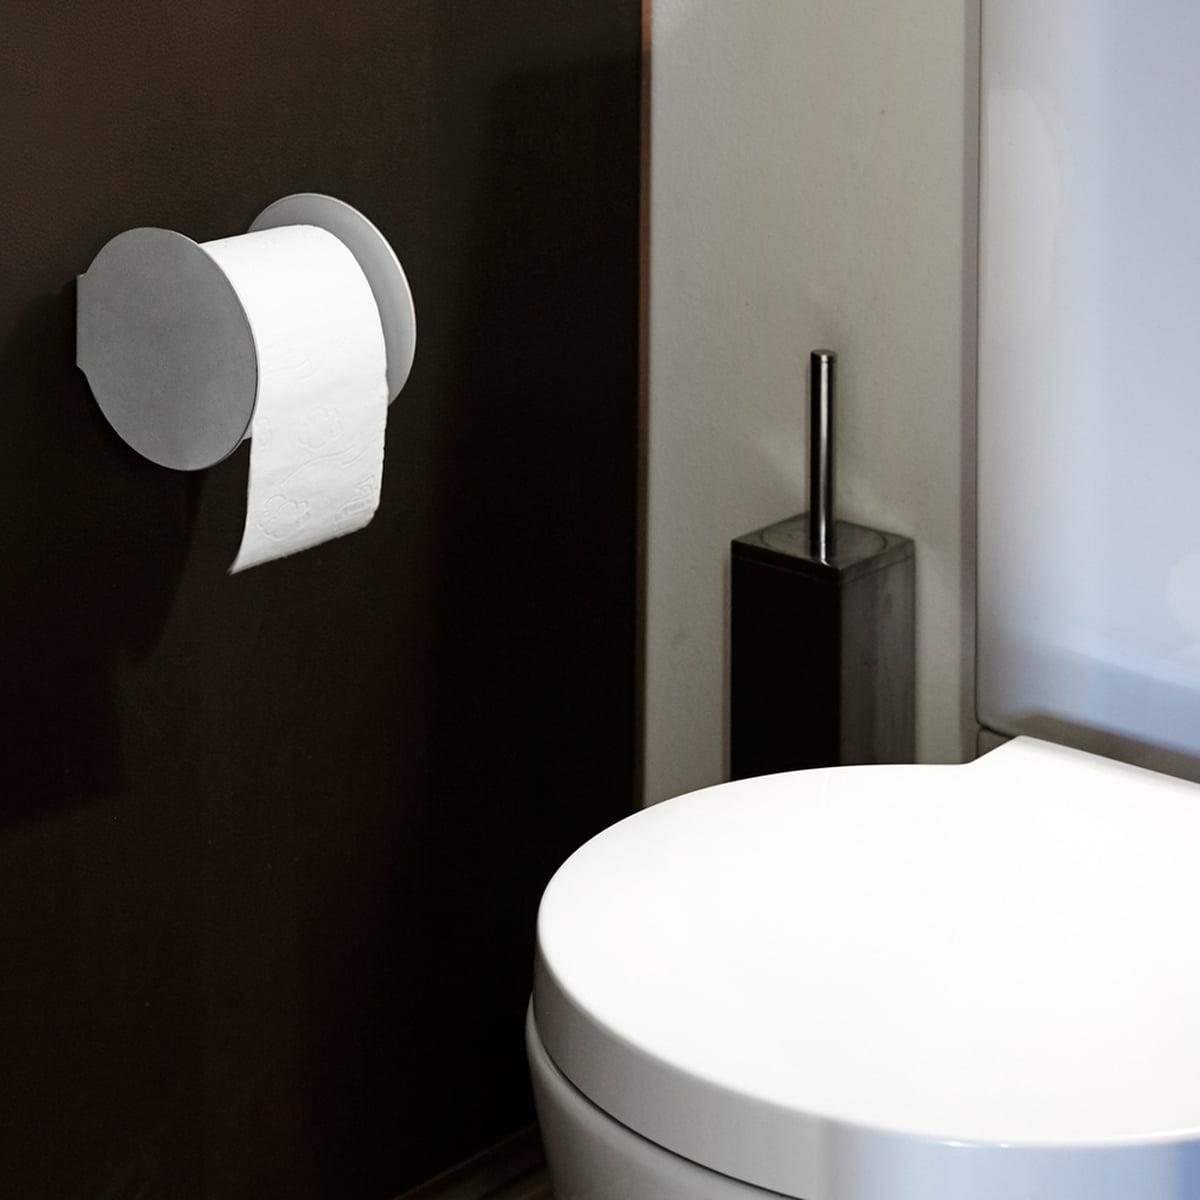 Marvelous Toilet Paper Holder By LindDNA